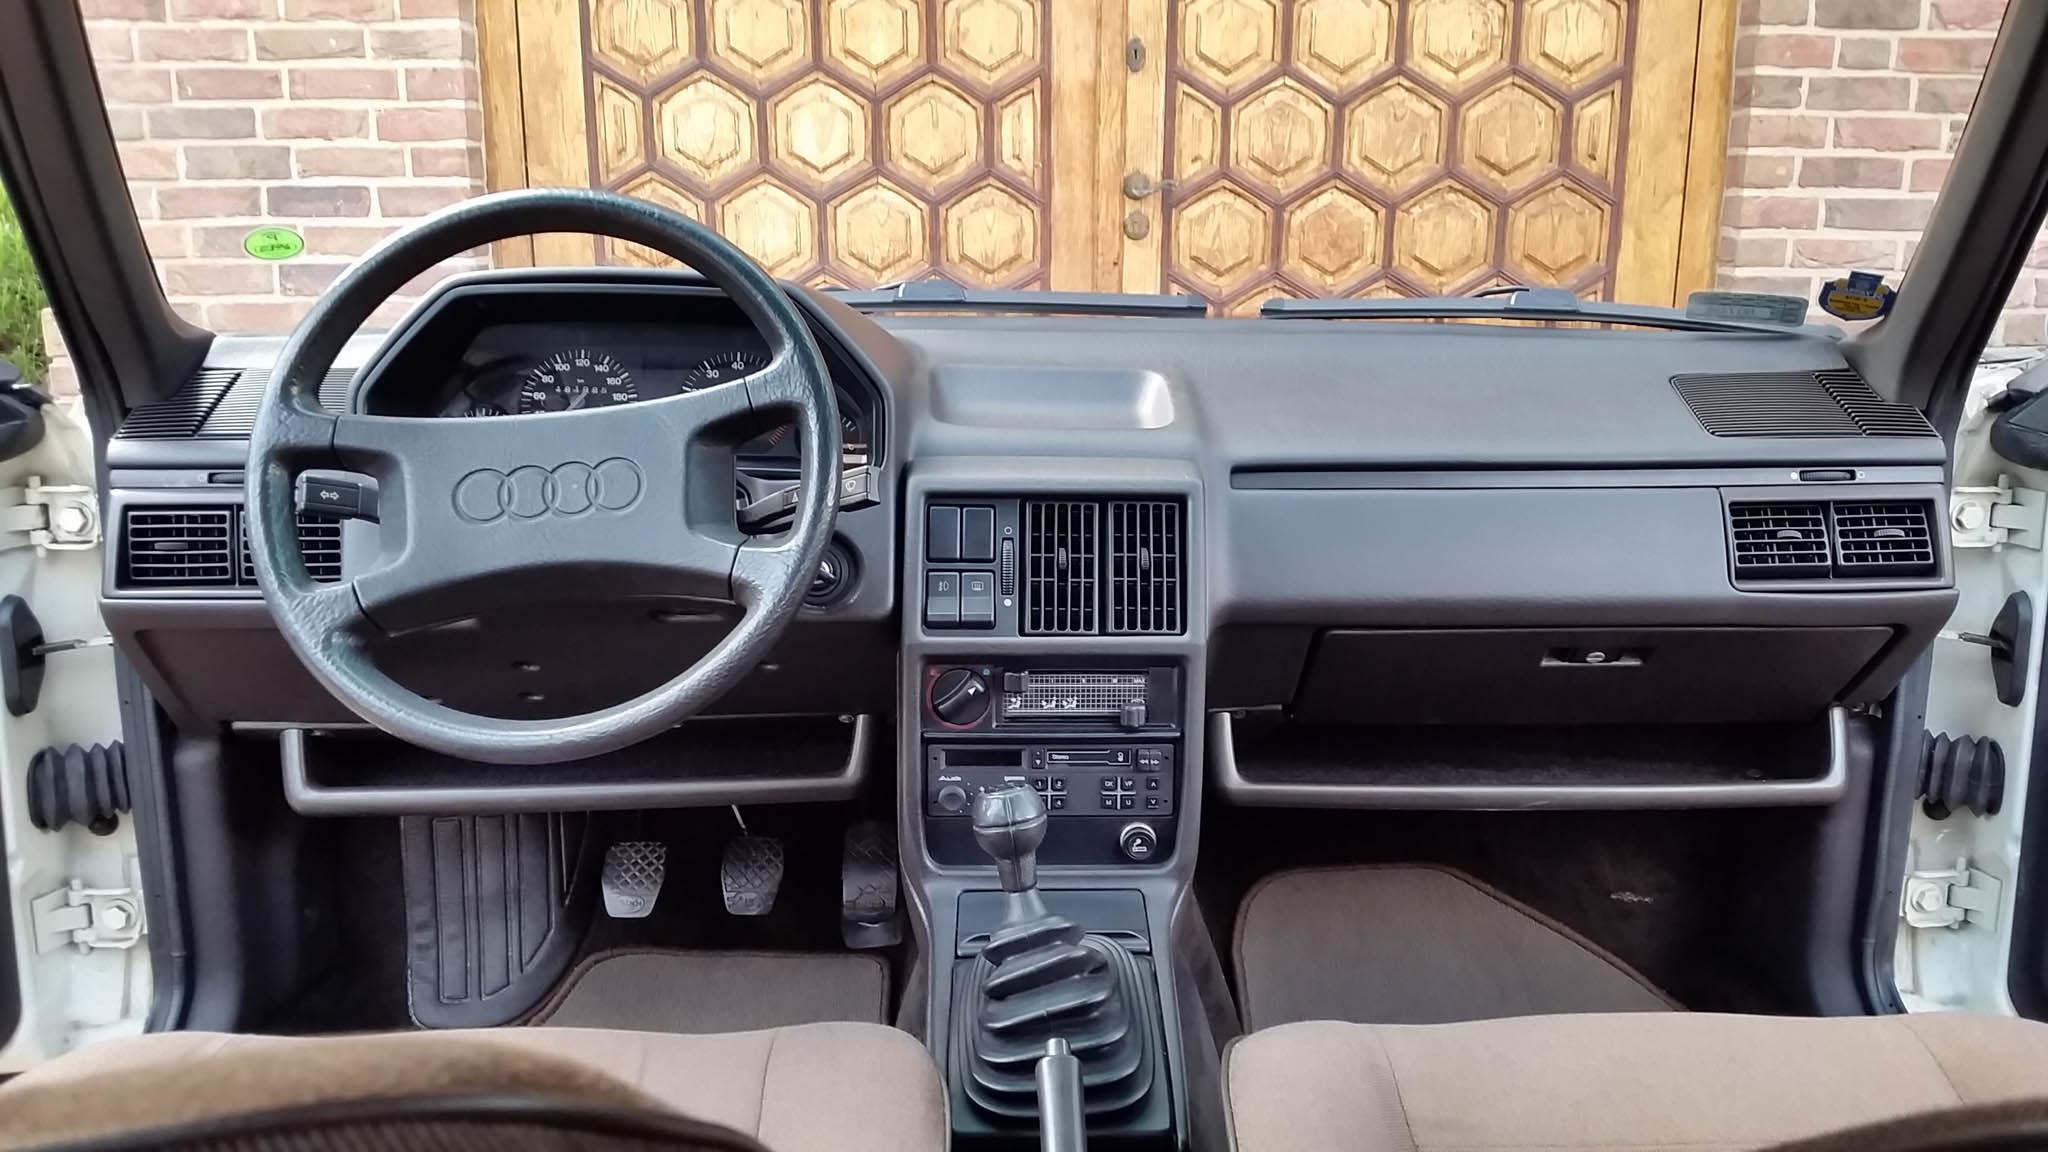 Audi 100 C3 1984 - 16500 PLN - Olsztyn | Giełda klasyków